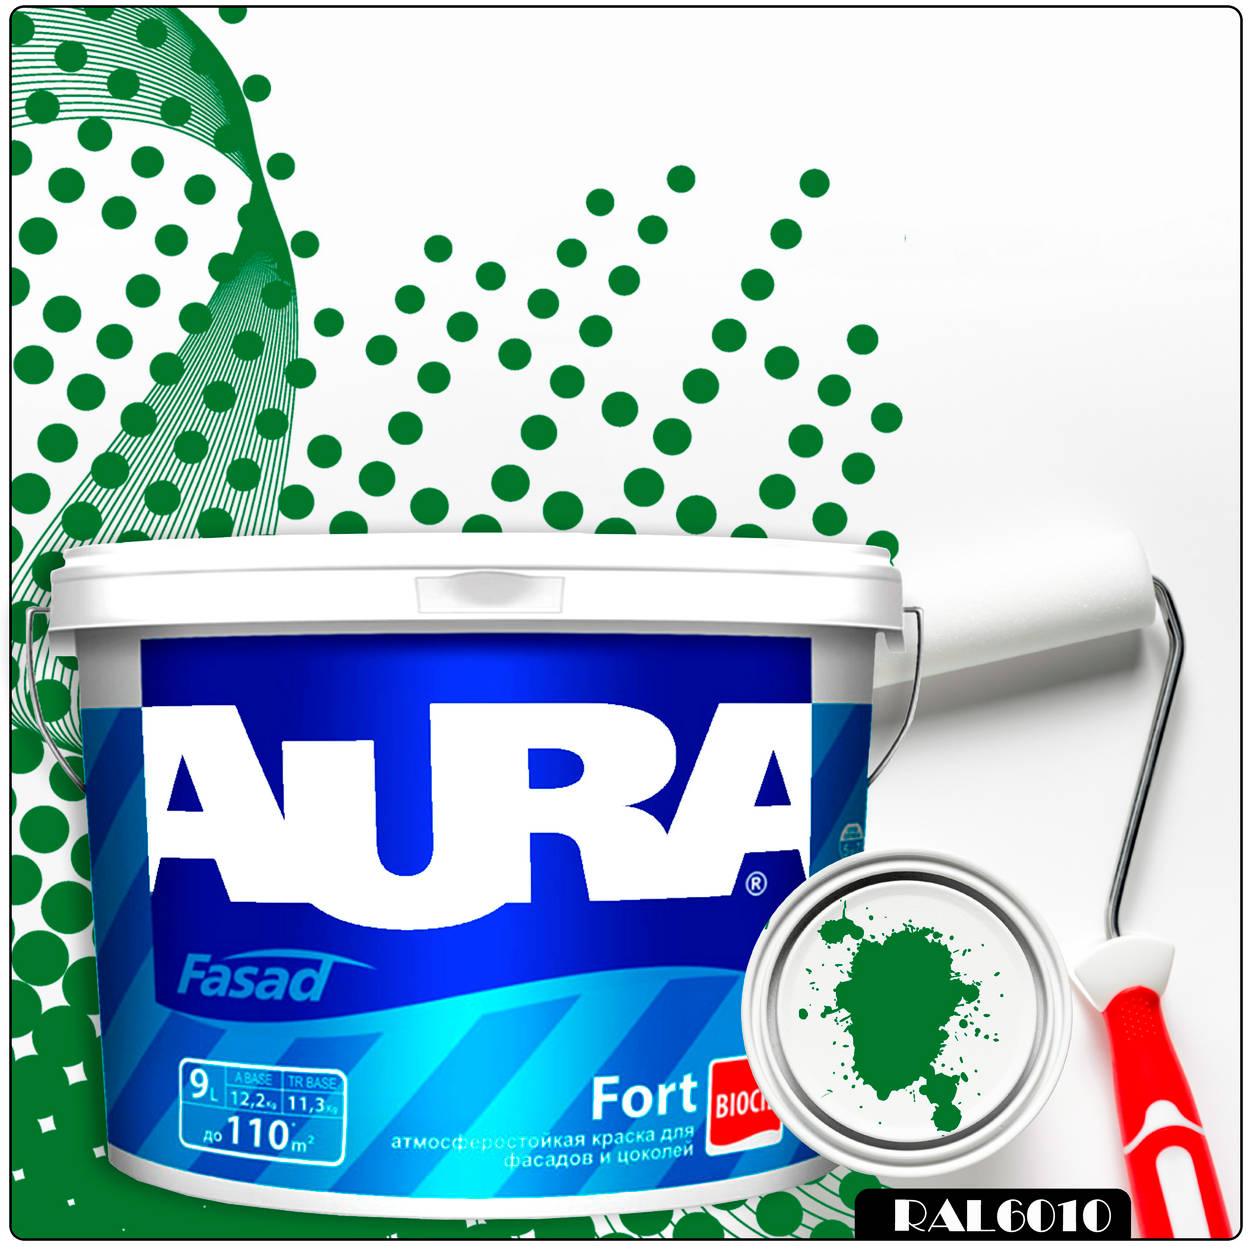 Фото 11 - Краска Aura Fasad Fort, RAL 6010 Зеленая трава, латексная, матовая, для фасада и цоколей, 9л, Аура.